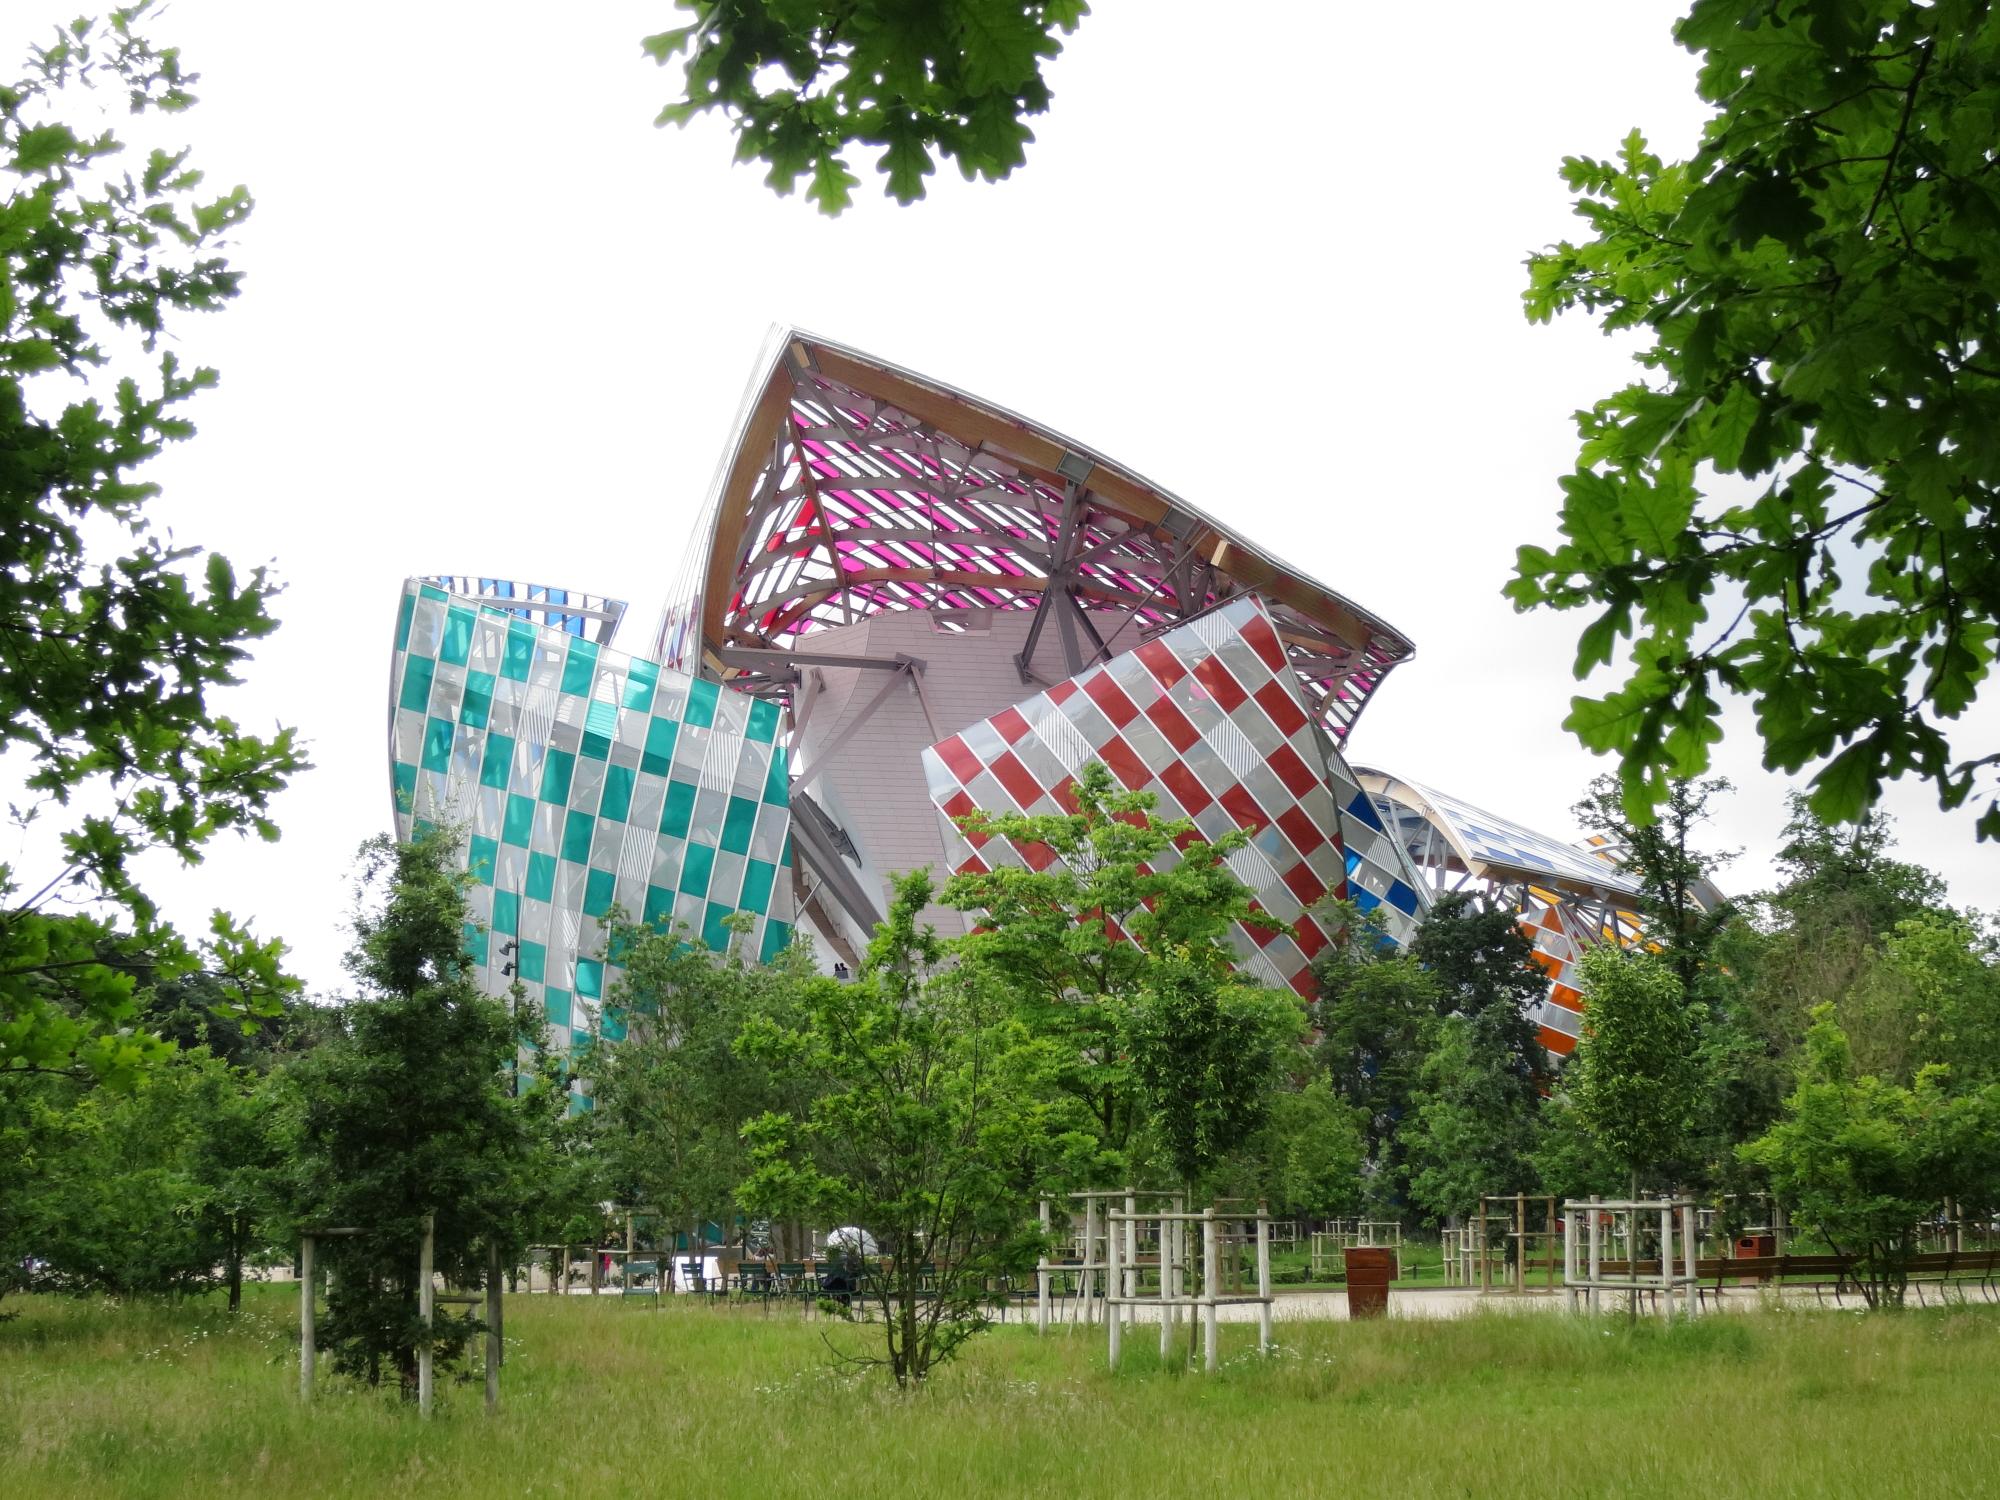 Hideous defacement of Frank Gehry's Fondation Louis Vuitton